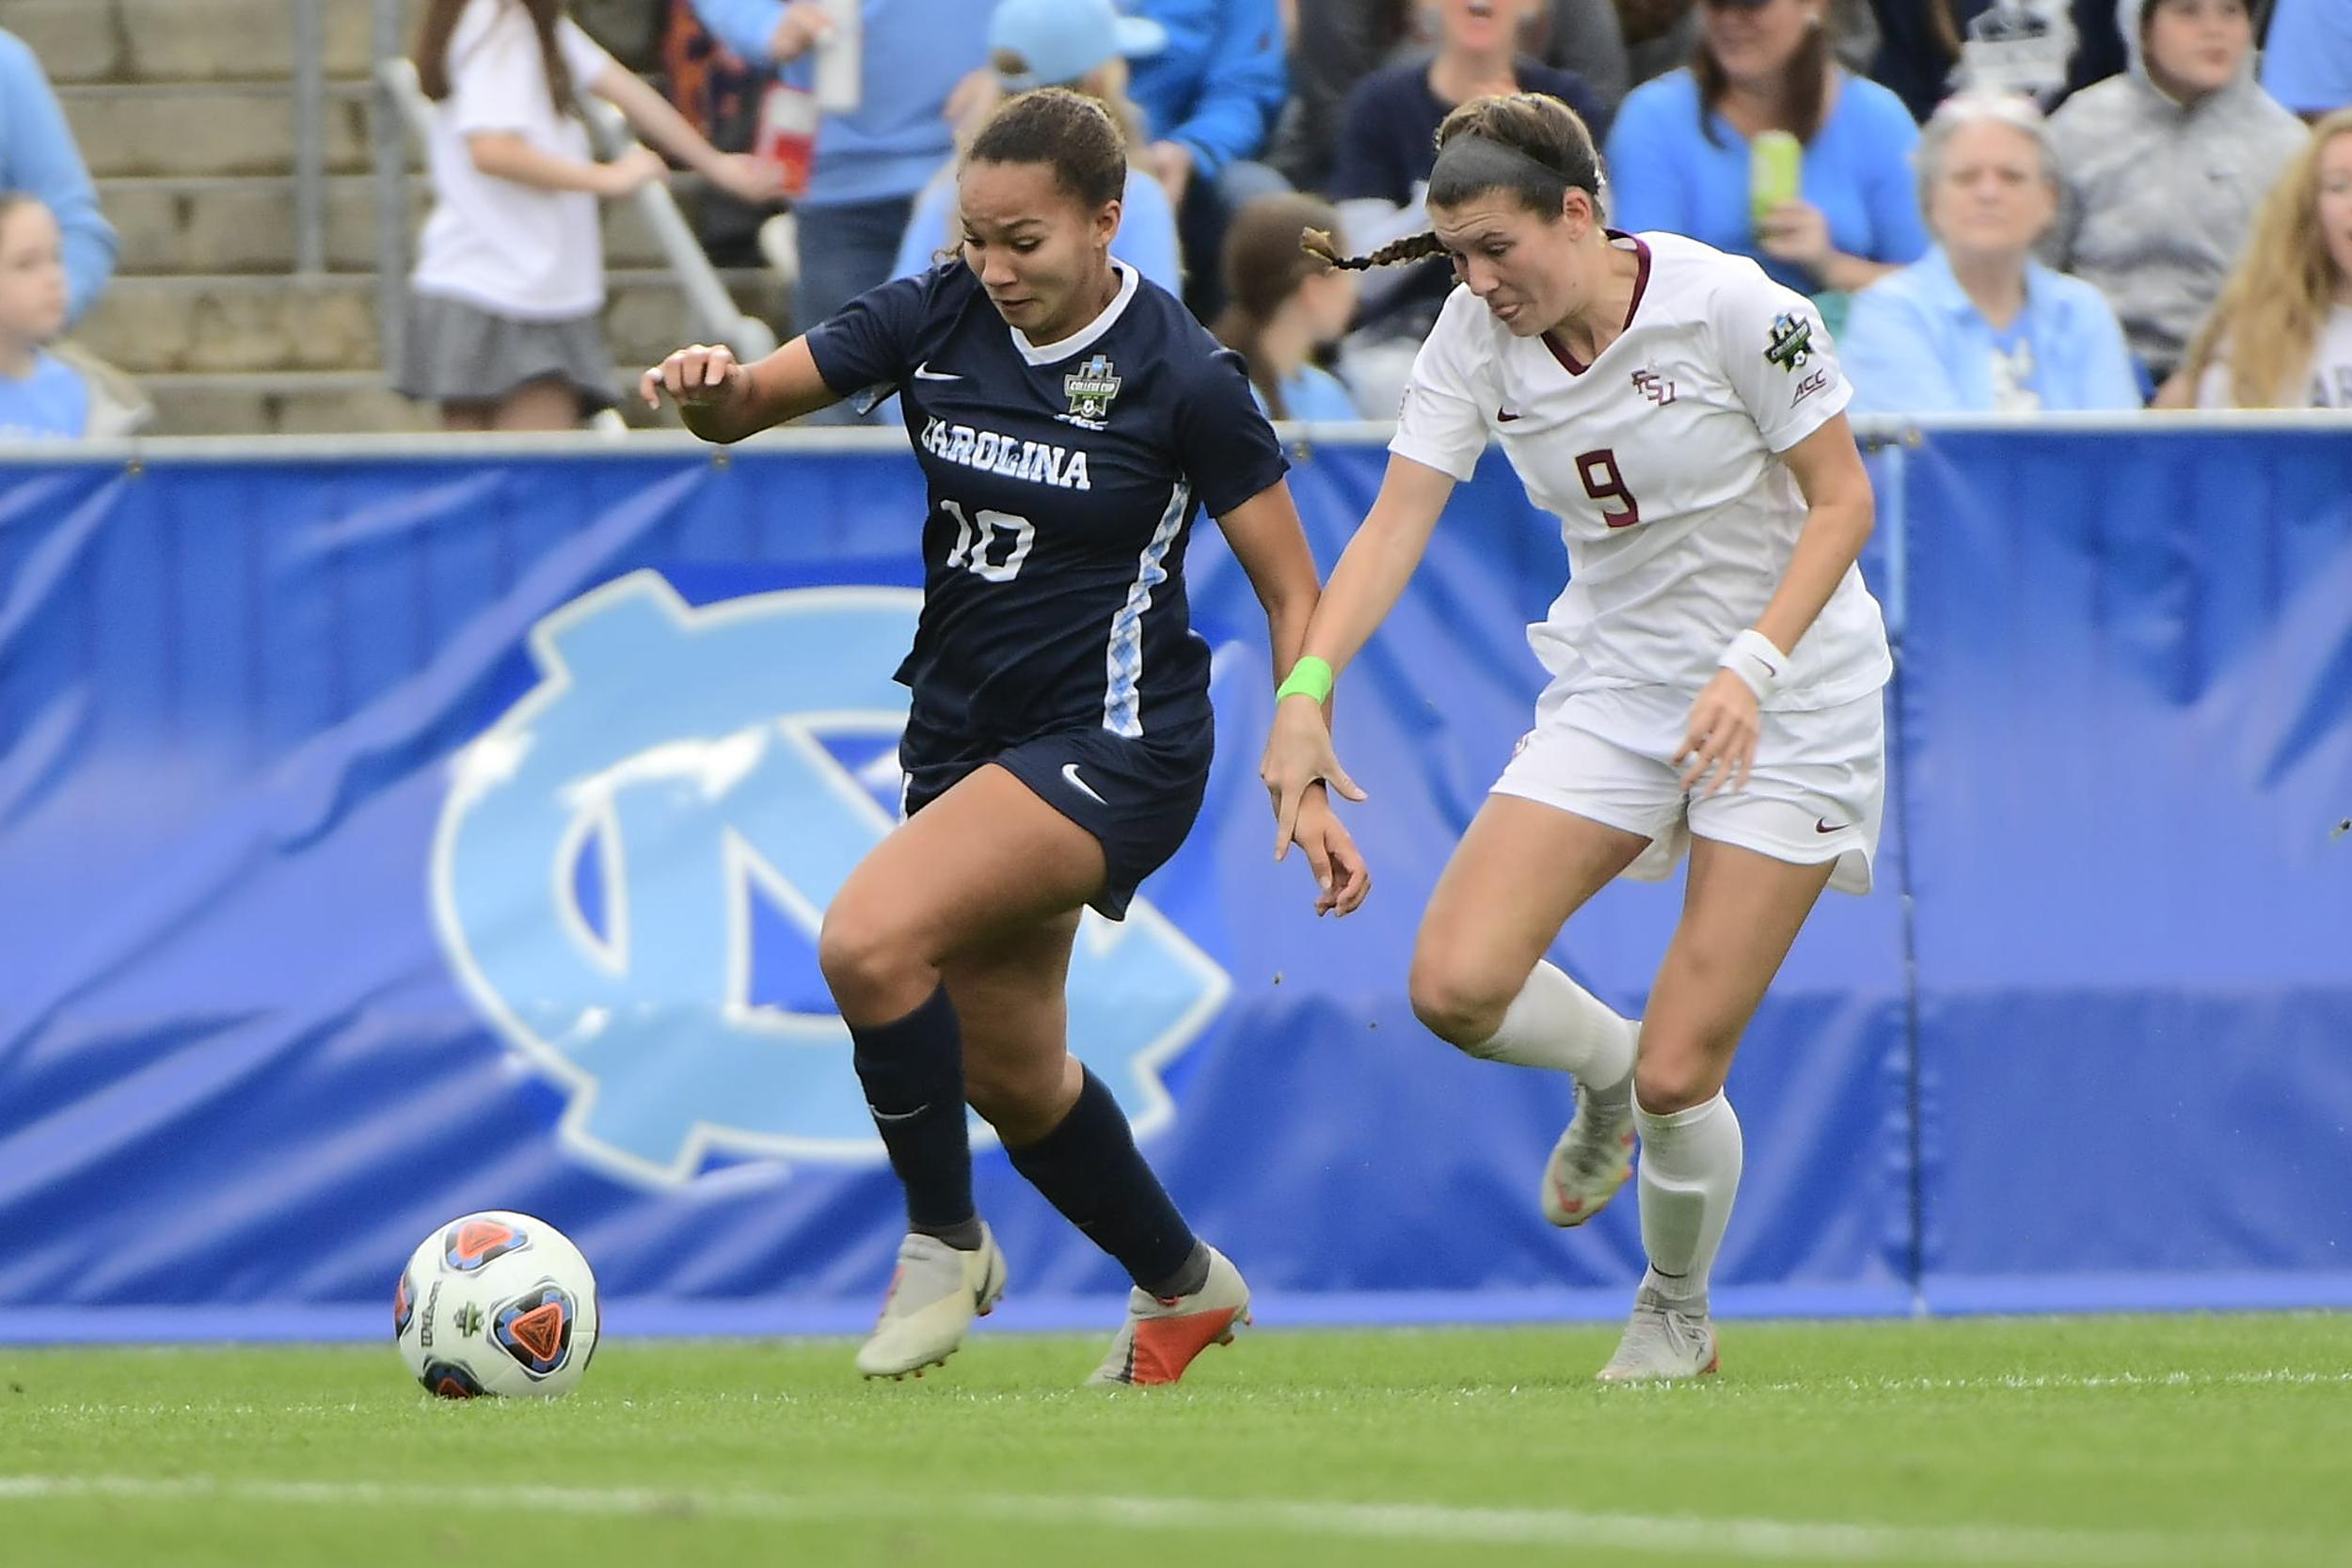 2018 NCAA Division I Women's Soccer Championship